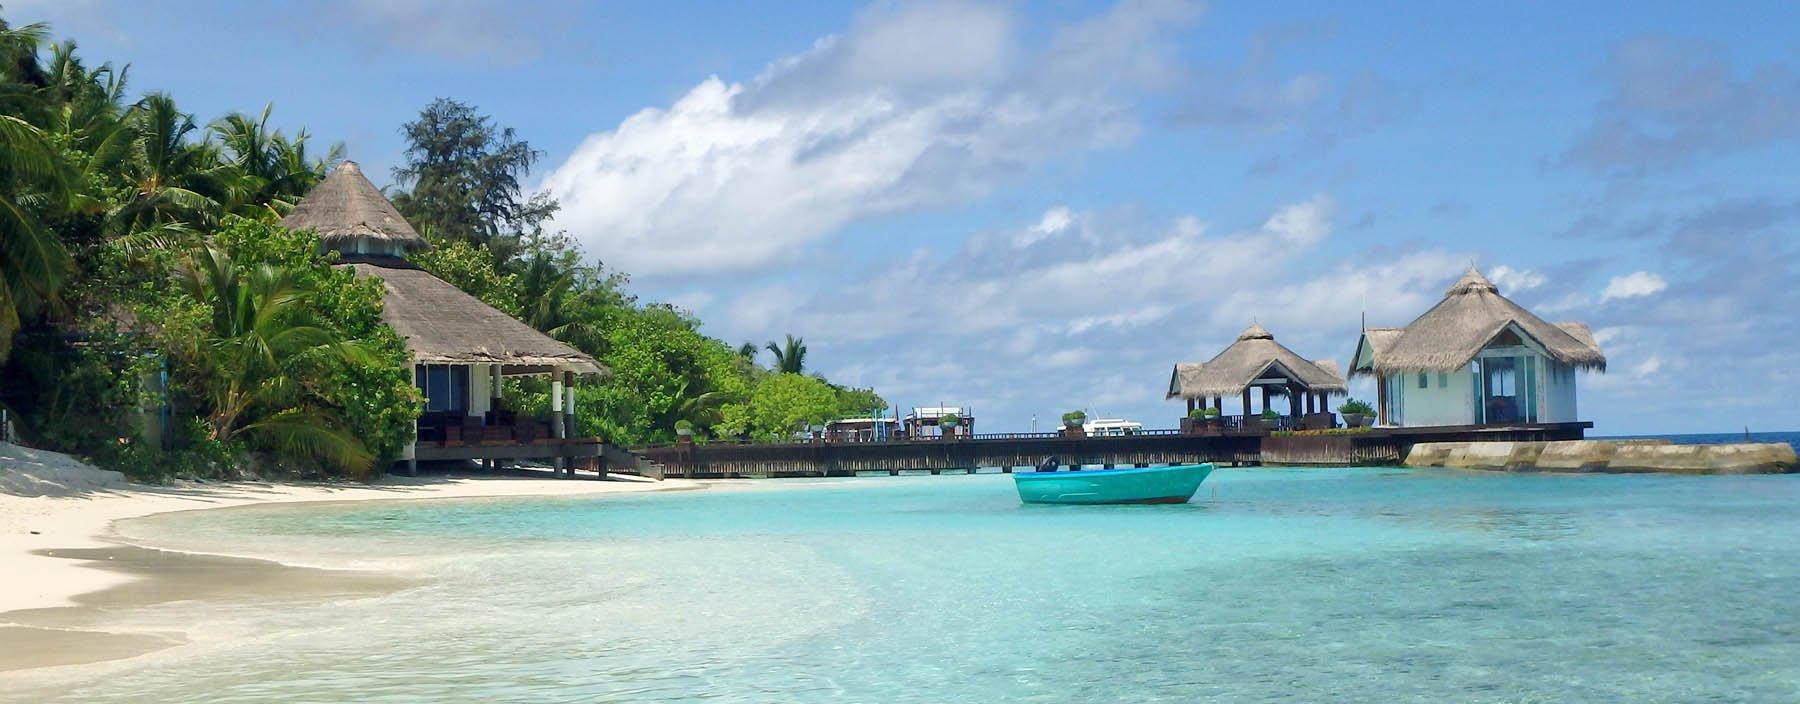 MV, Malediven